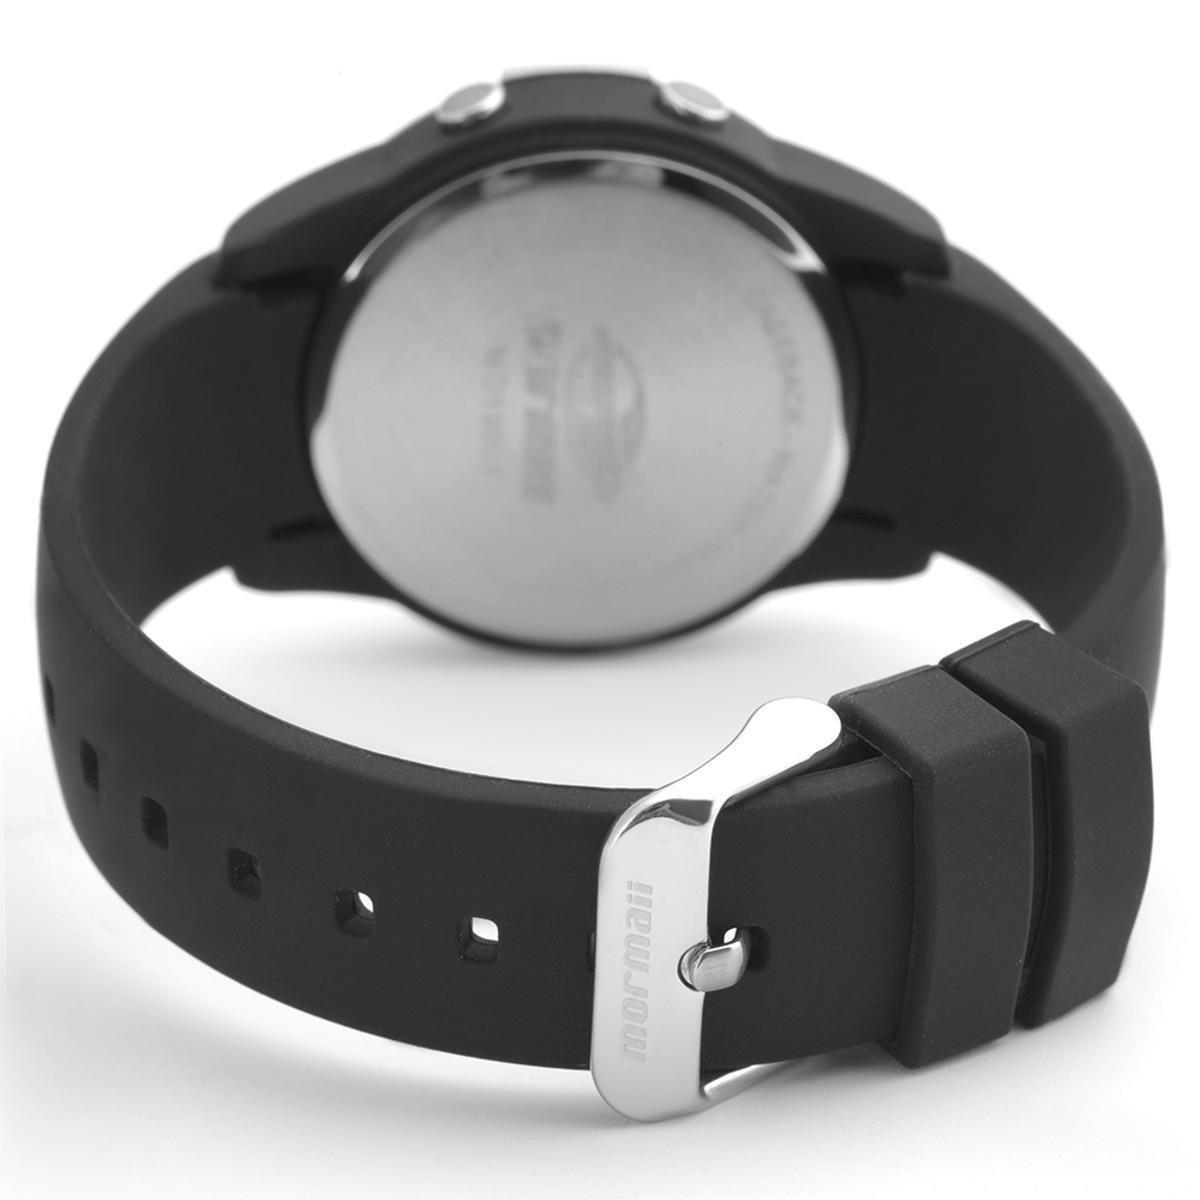 Relógio Mormaii Feminino Luau - MO13001 8A MO13001 8A - Preto ... c27104046b